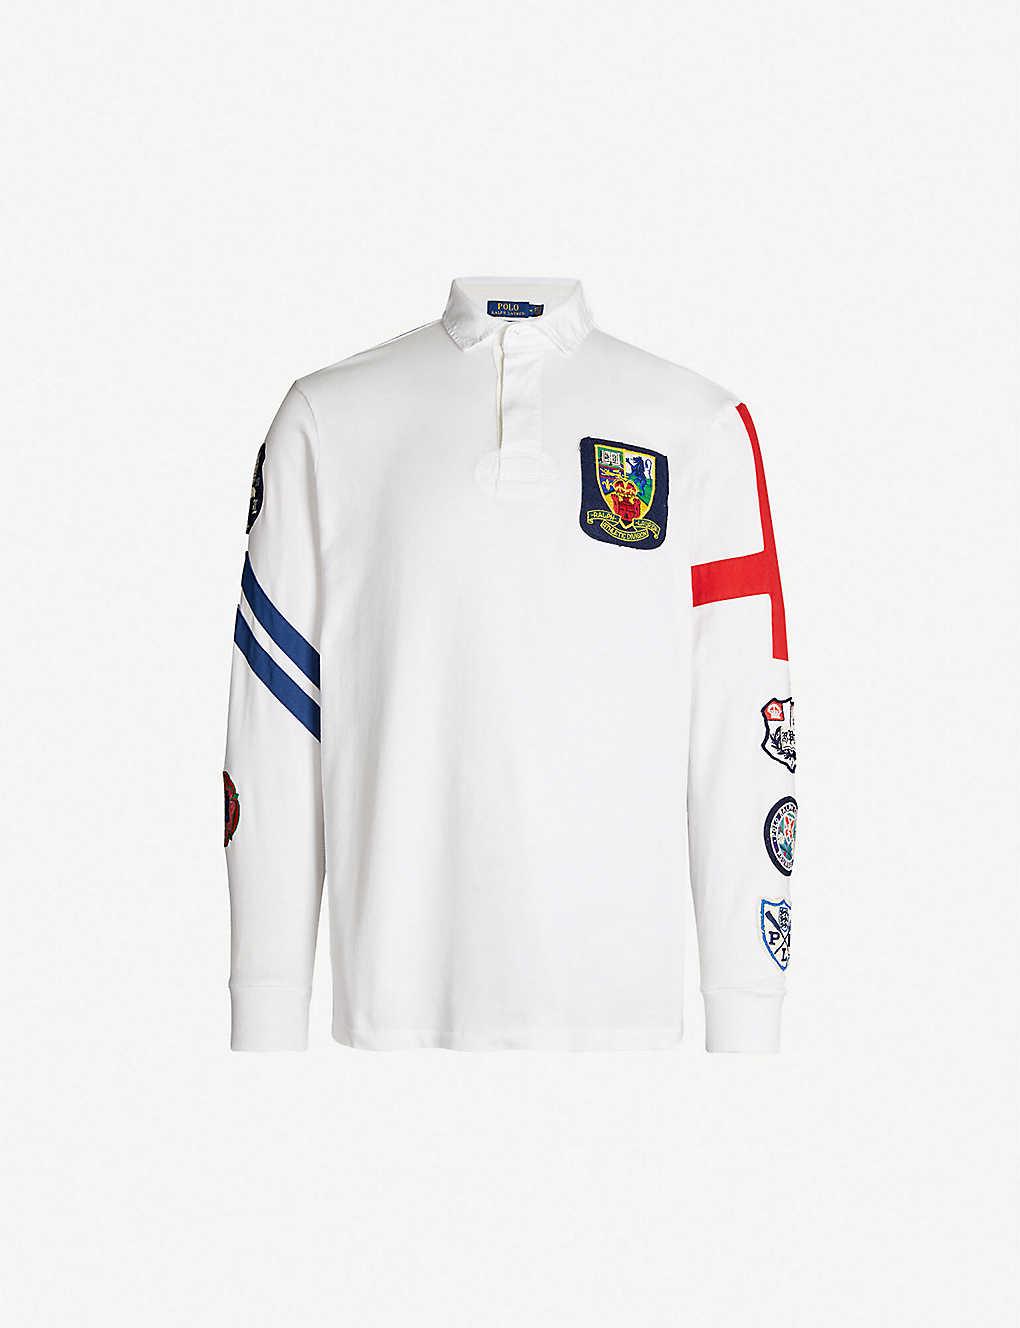 Polo Ralph Lauren Rugby Inspired Cotton Polo Shirt Selfridges